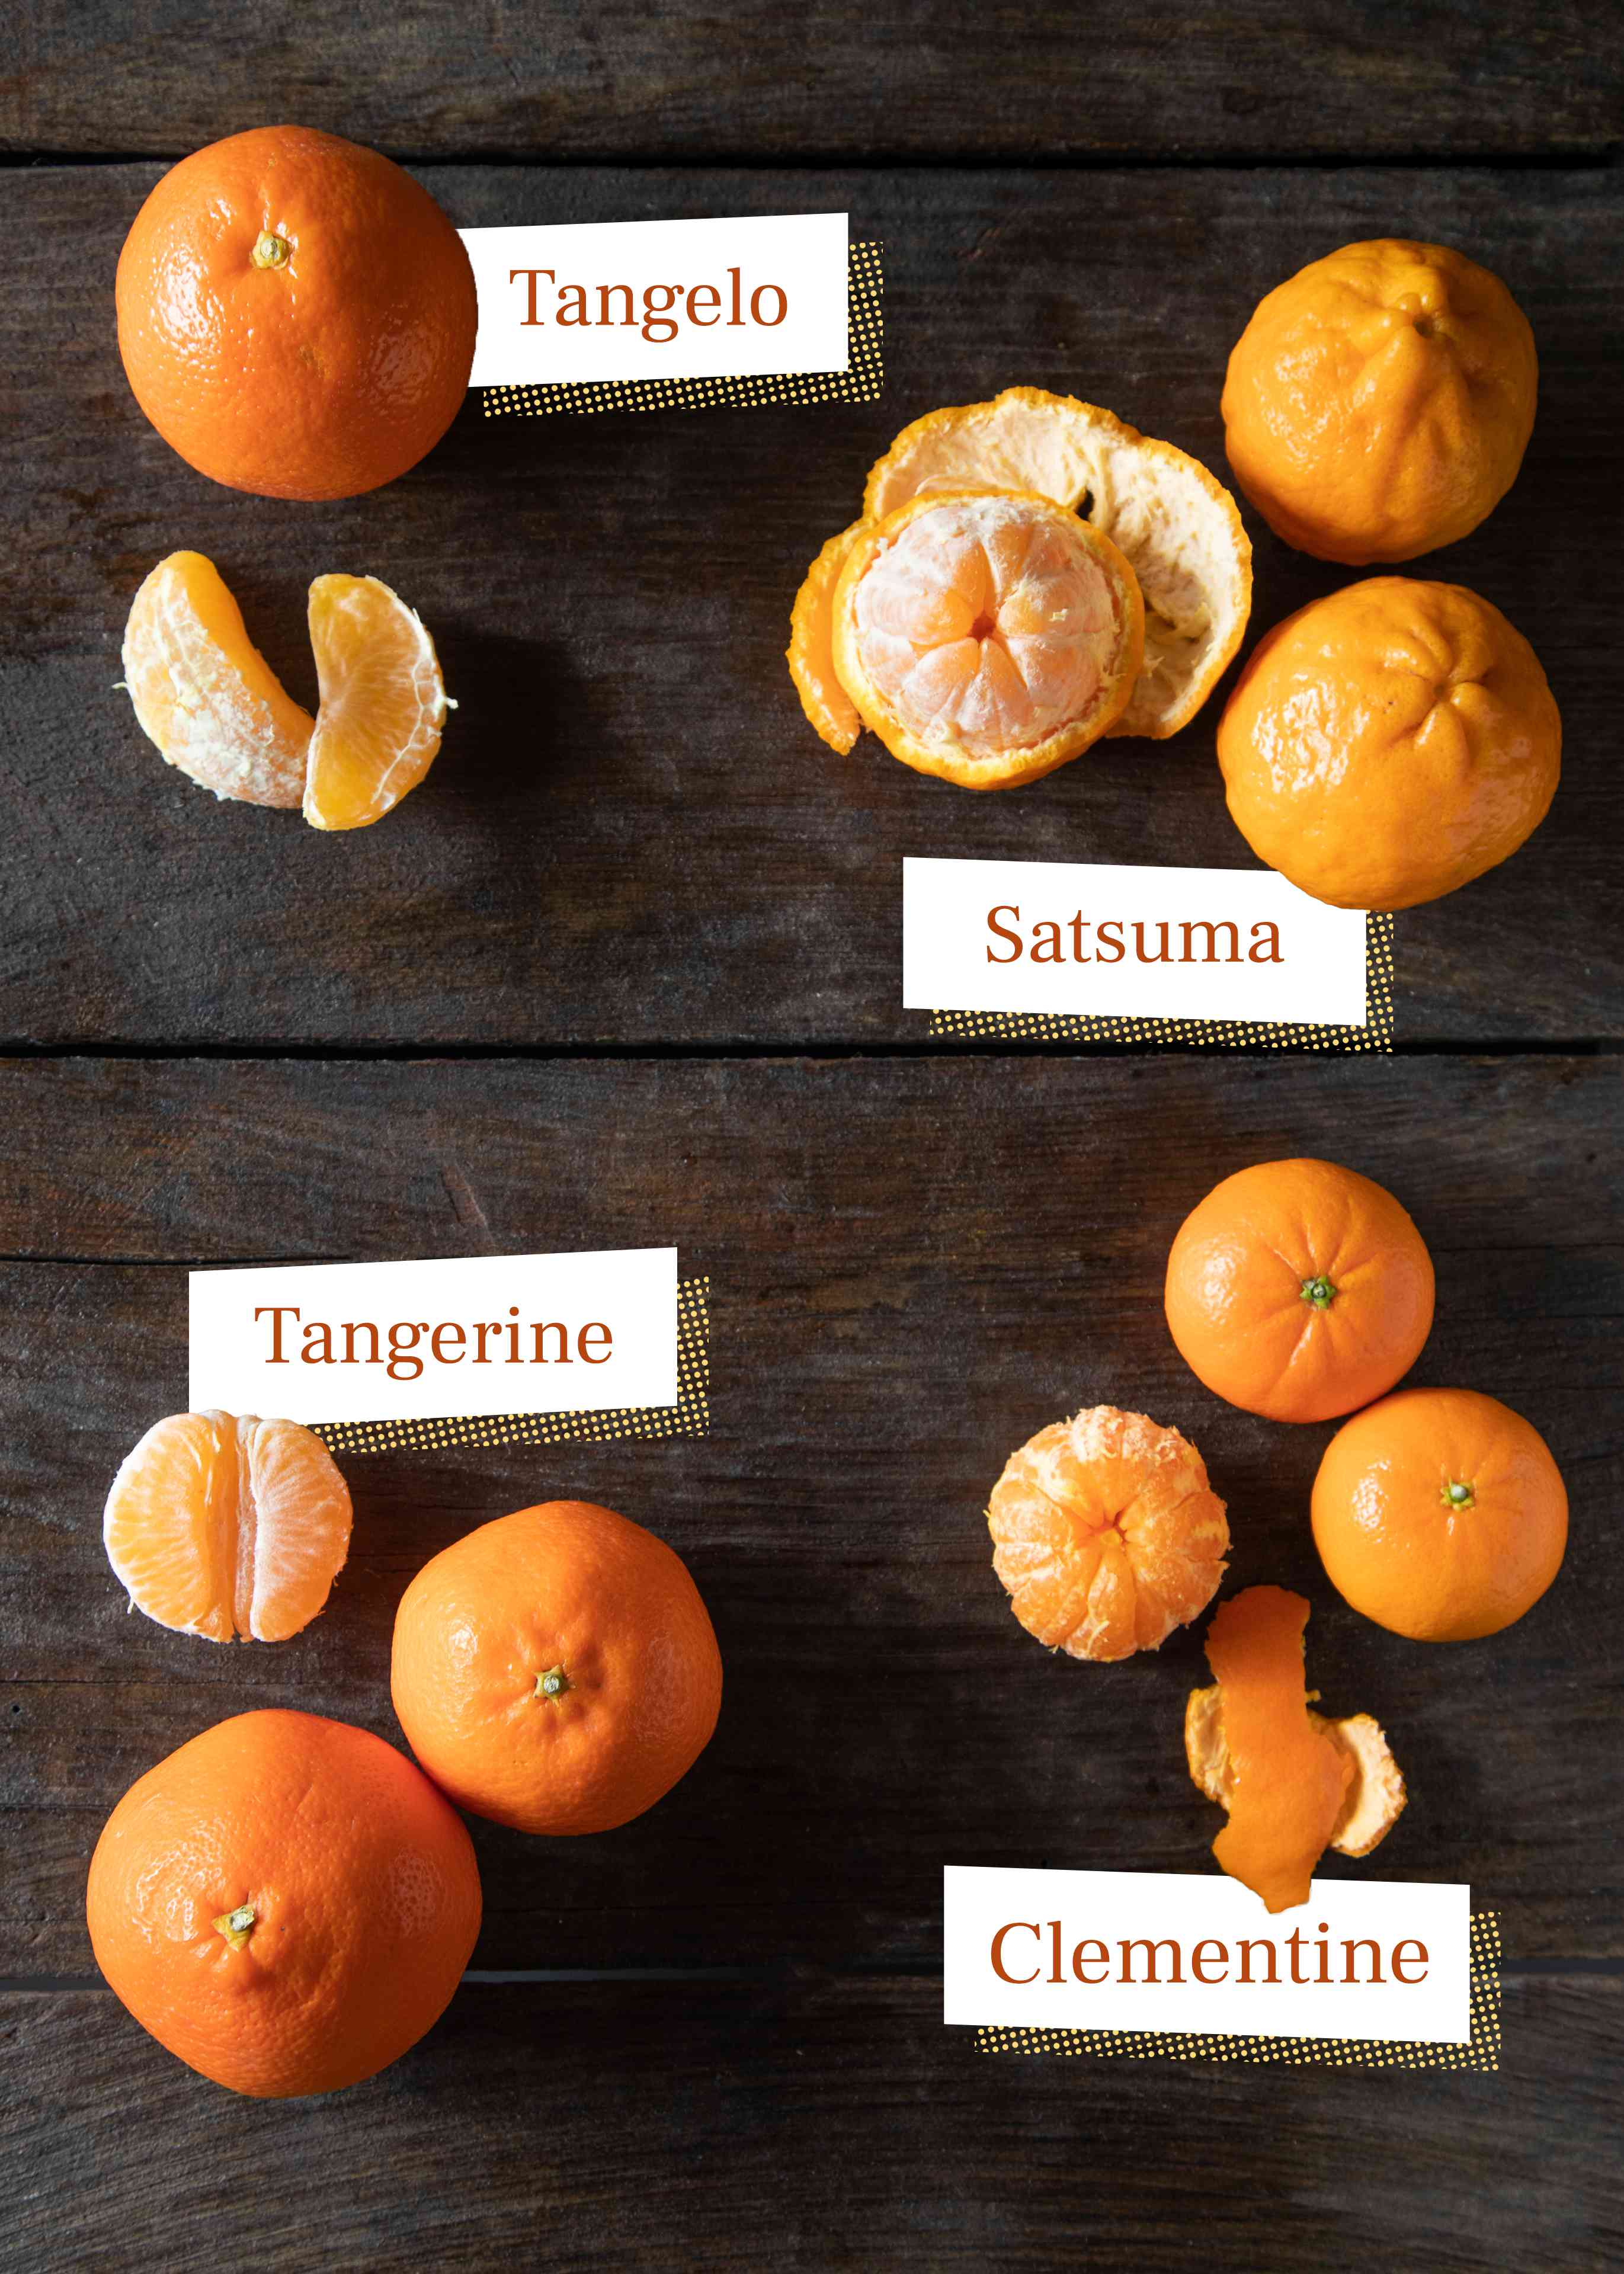 Mandarin varieties, tangelo, satsuma, tangerine, clementine on dark background